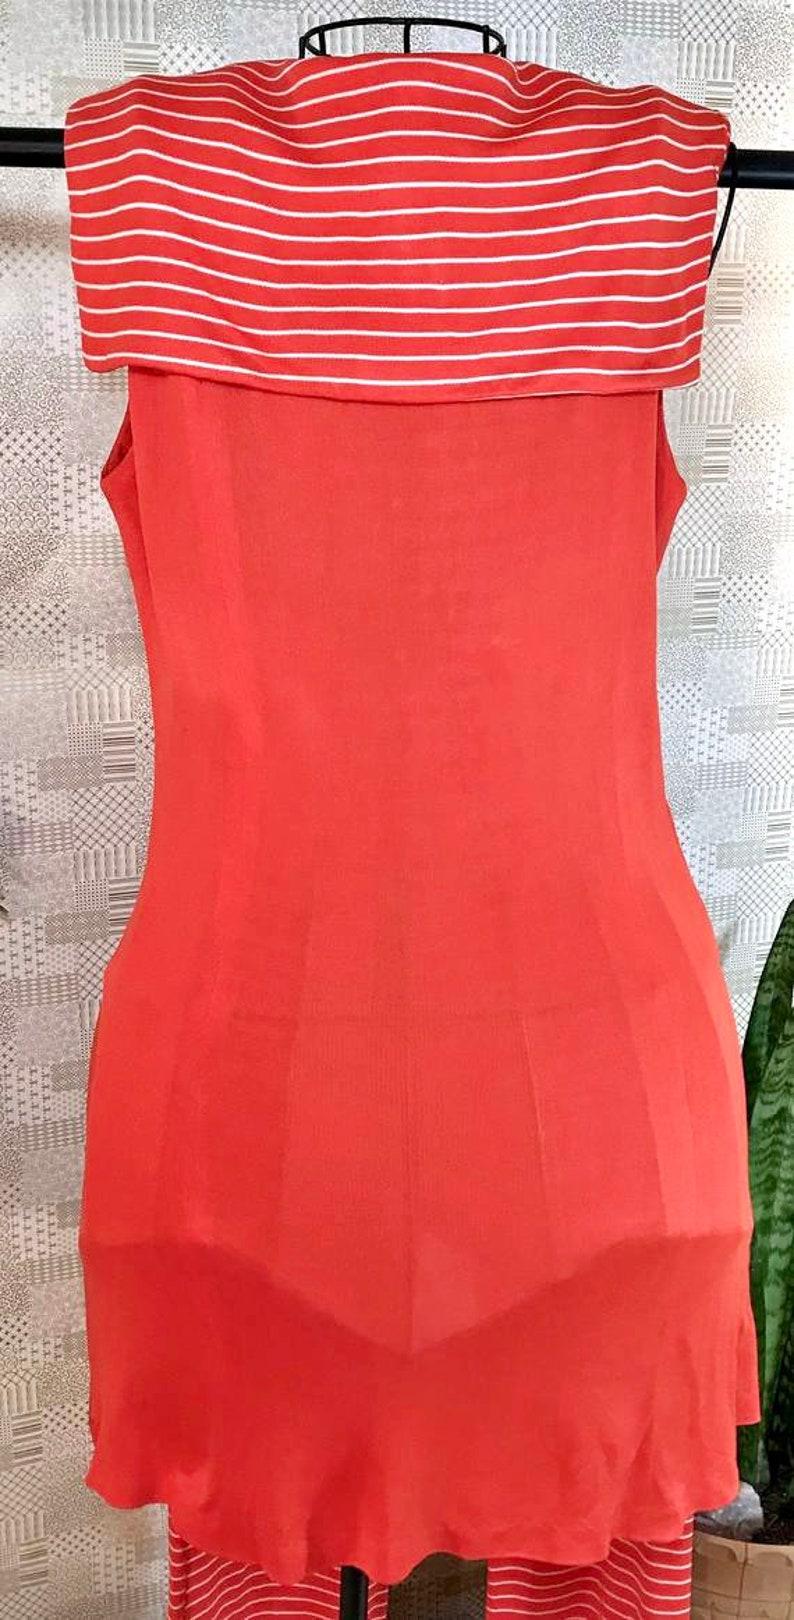 size 13 Mid century mod Jane Compton jumpsuit bright orange women\u2019s size mediumlarge 1960\u2019s sleeveless ILGWU stripes yolk collar